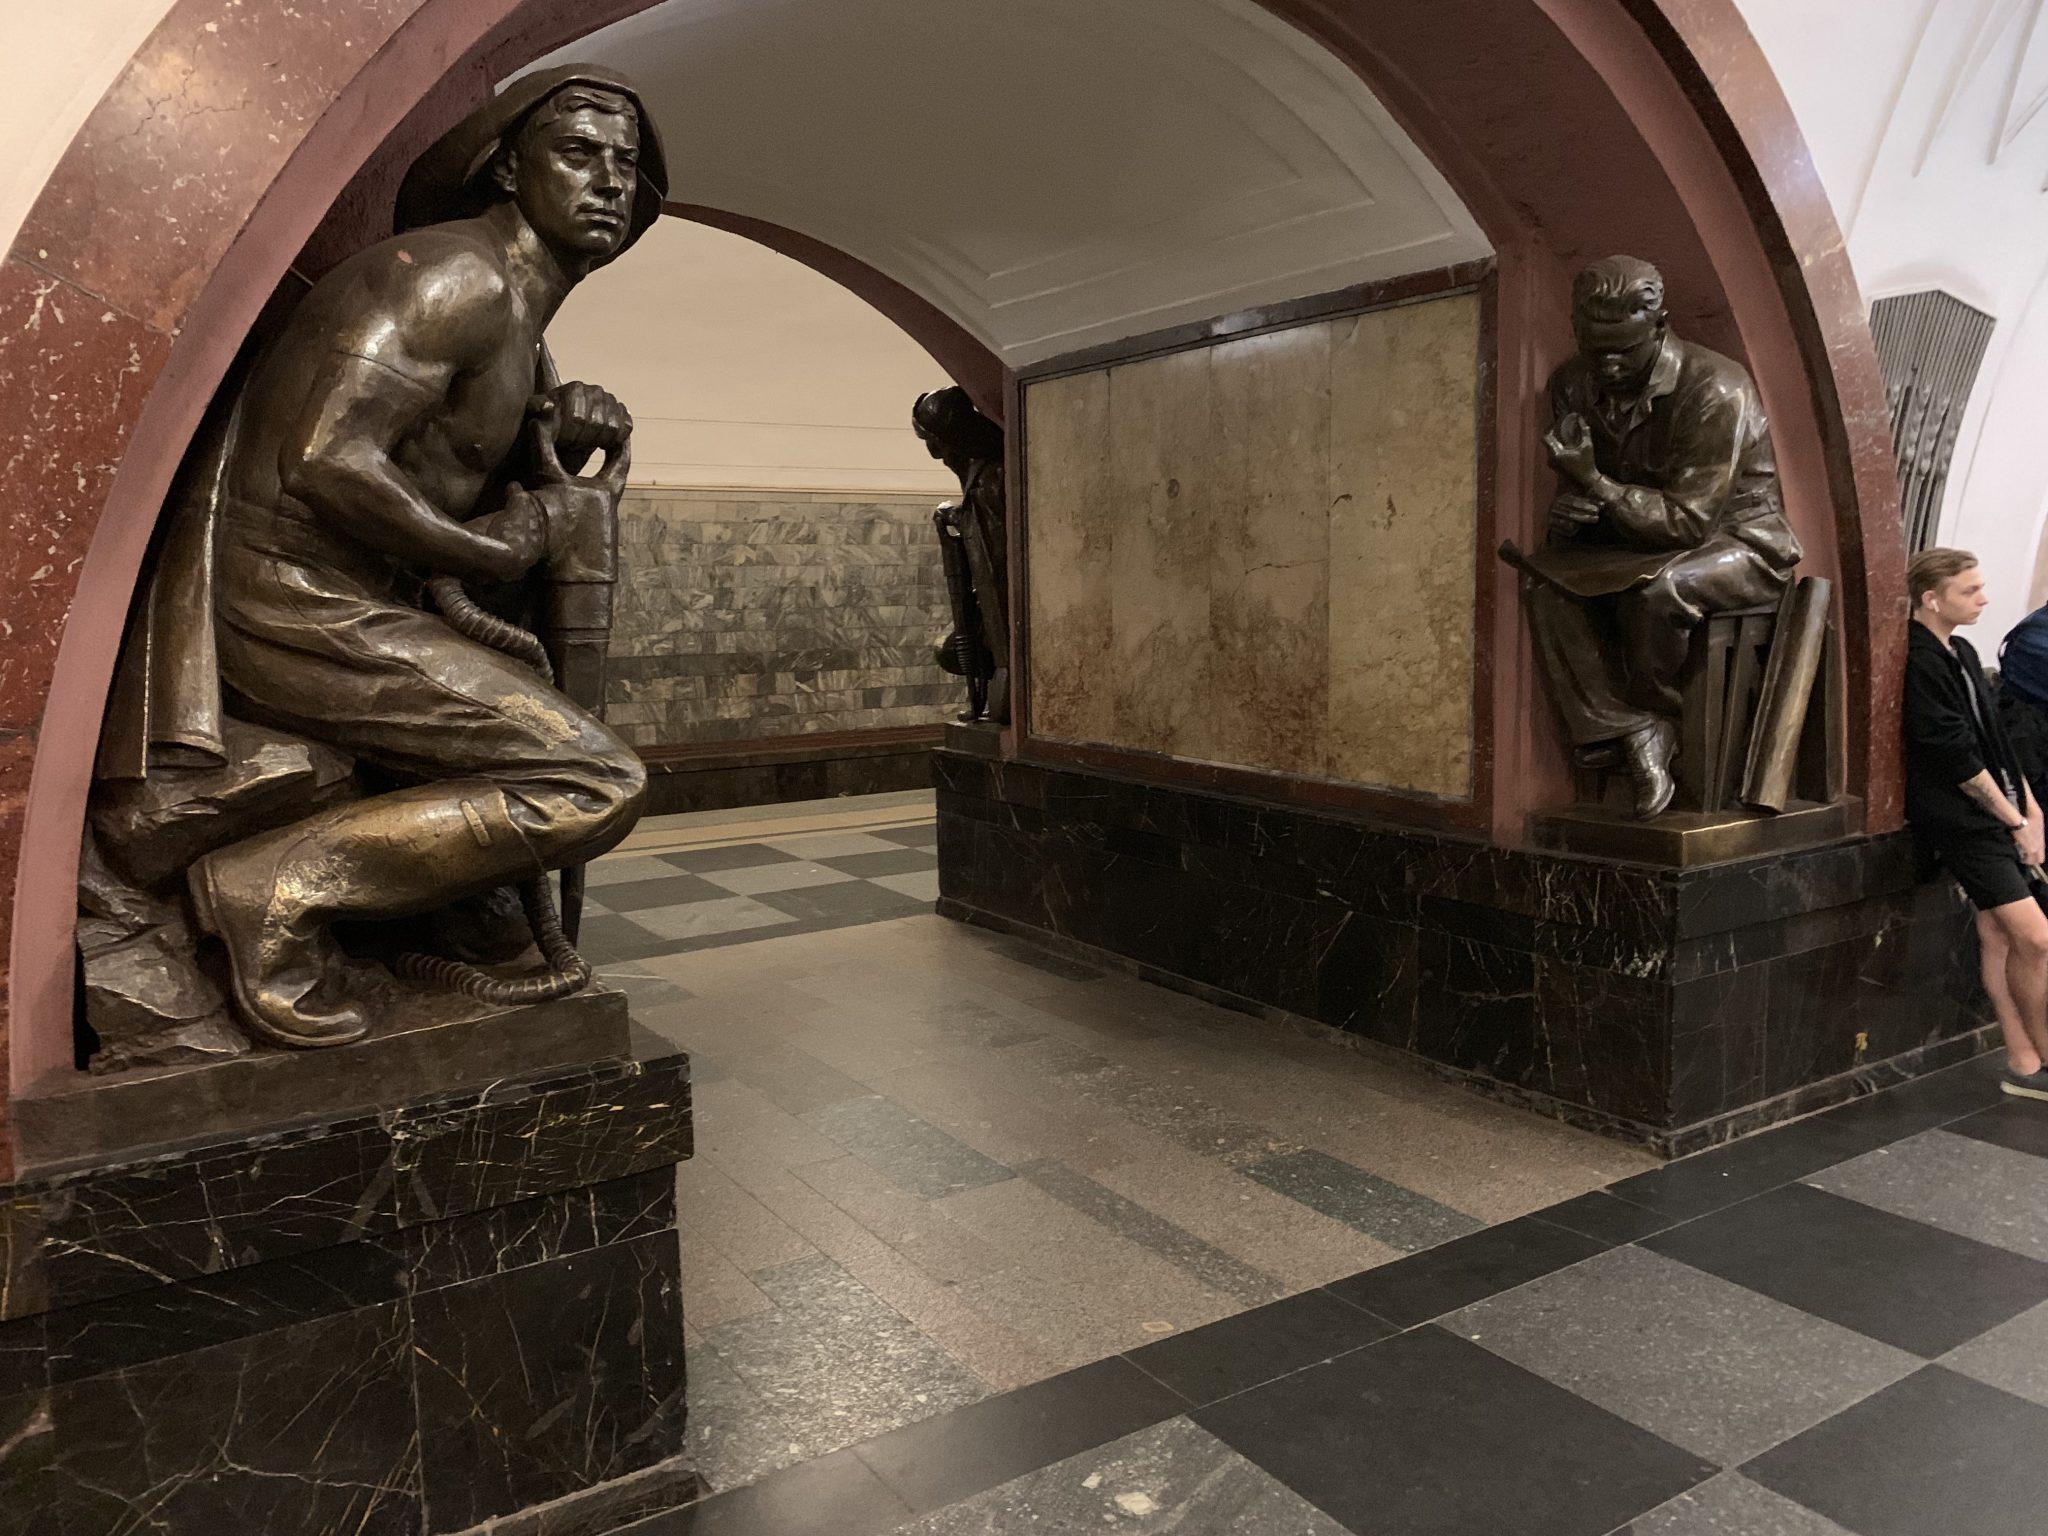 Moscow Metro Ploshchad Revolyutsii Площадь Революции